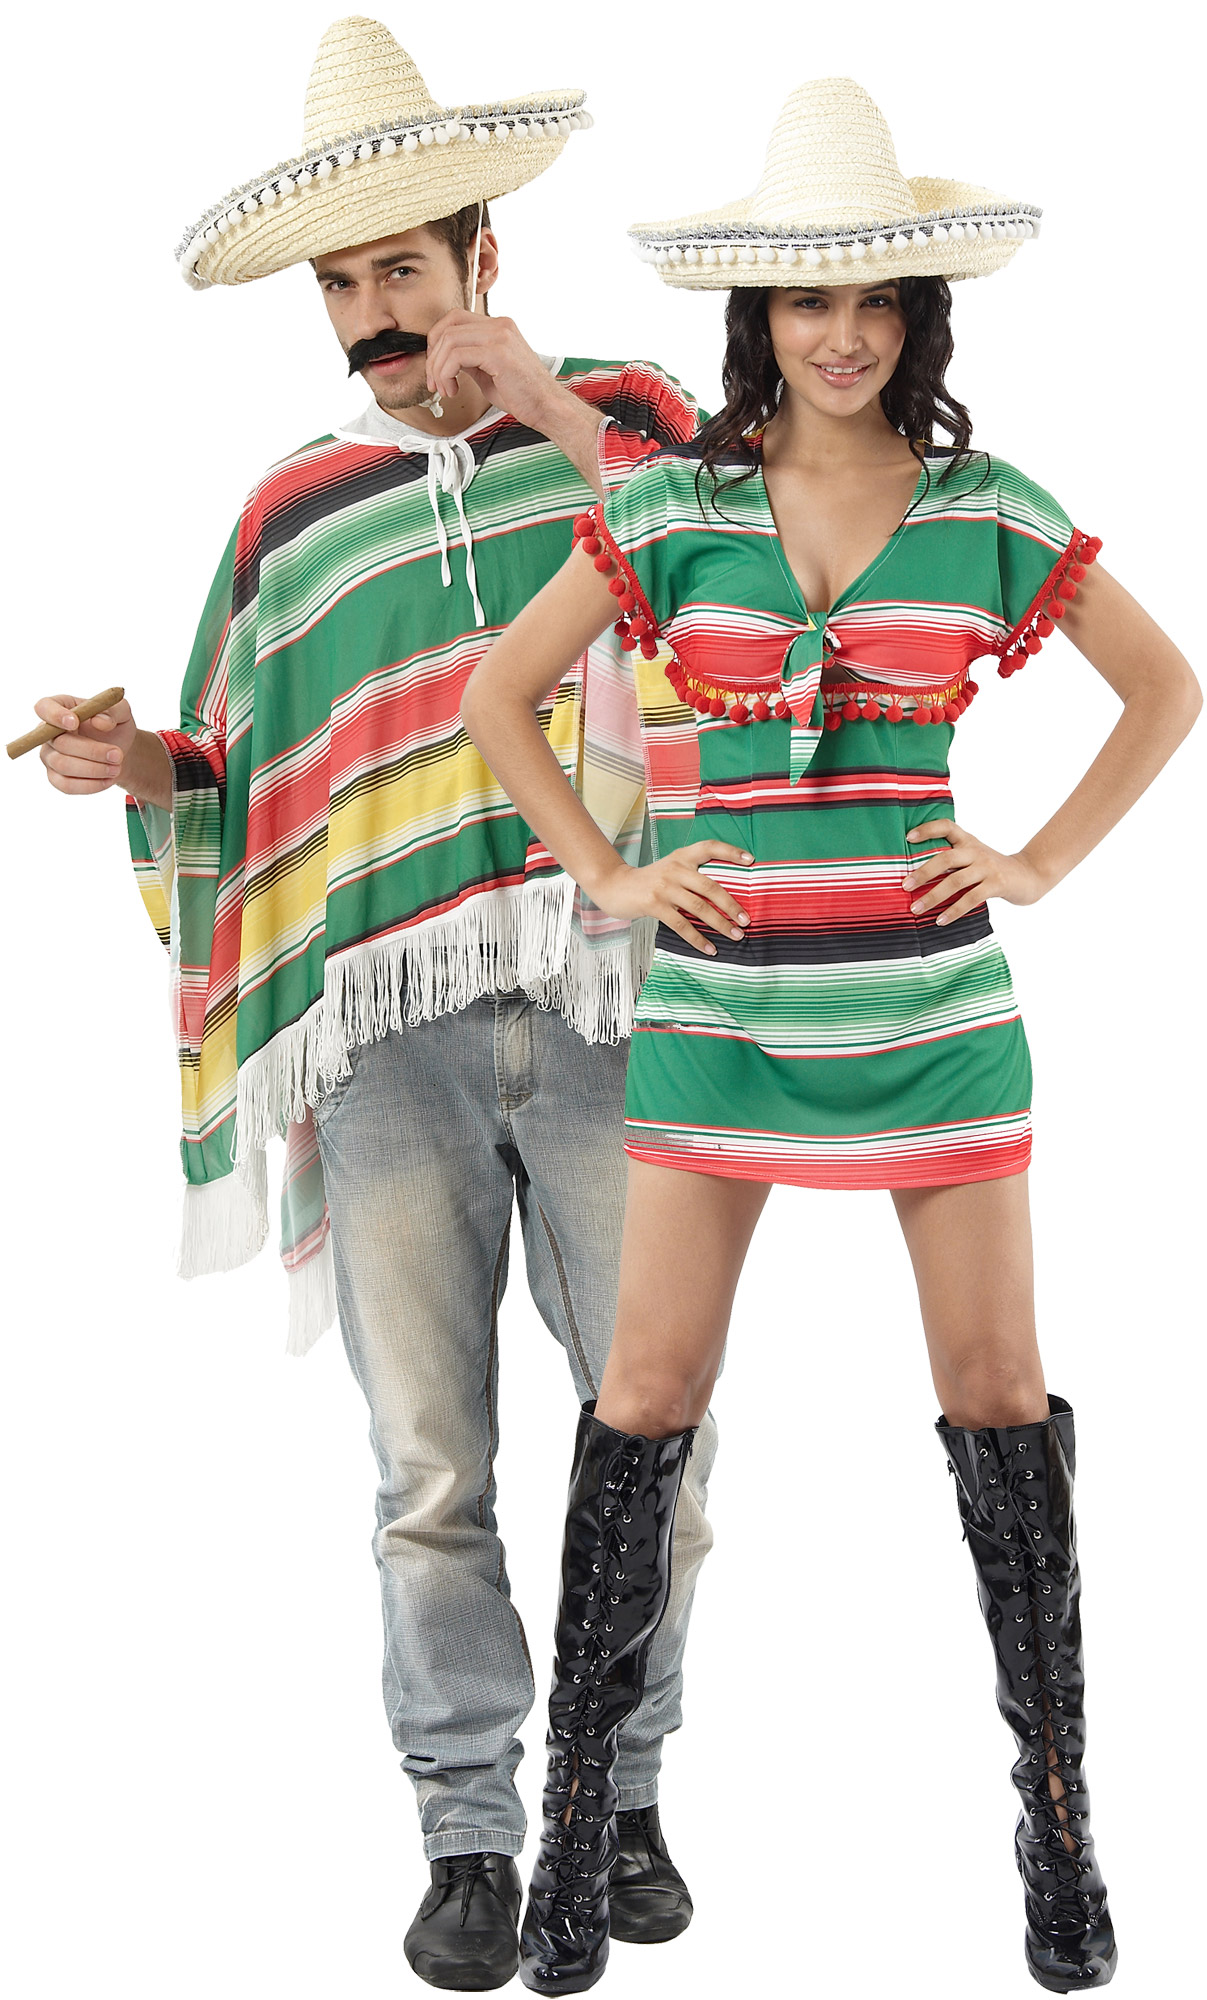 Mexicains Messieurs Costume Musicien Mariachi Messieurs Costume